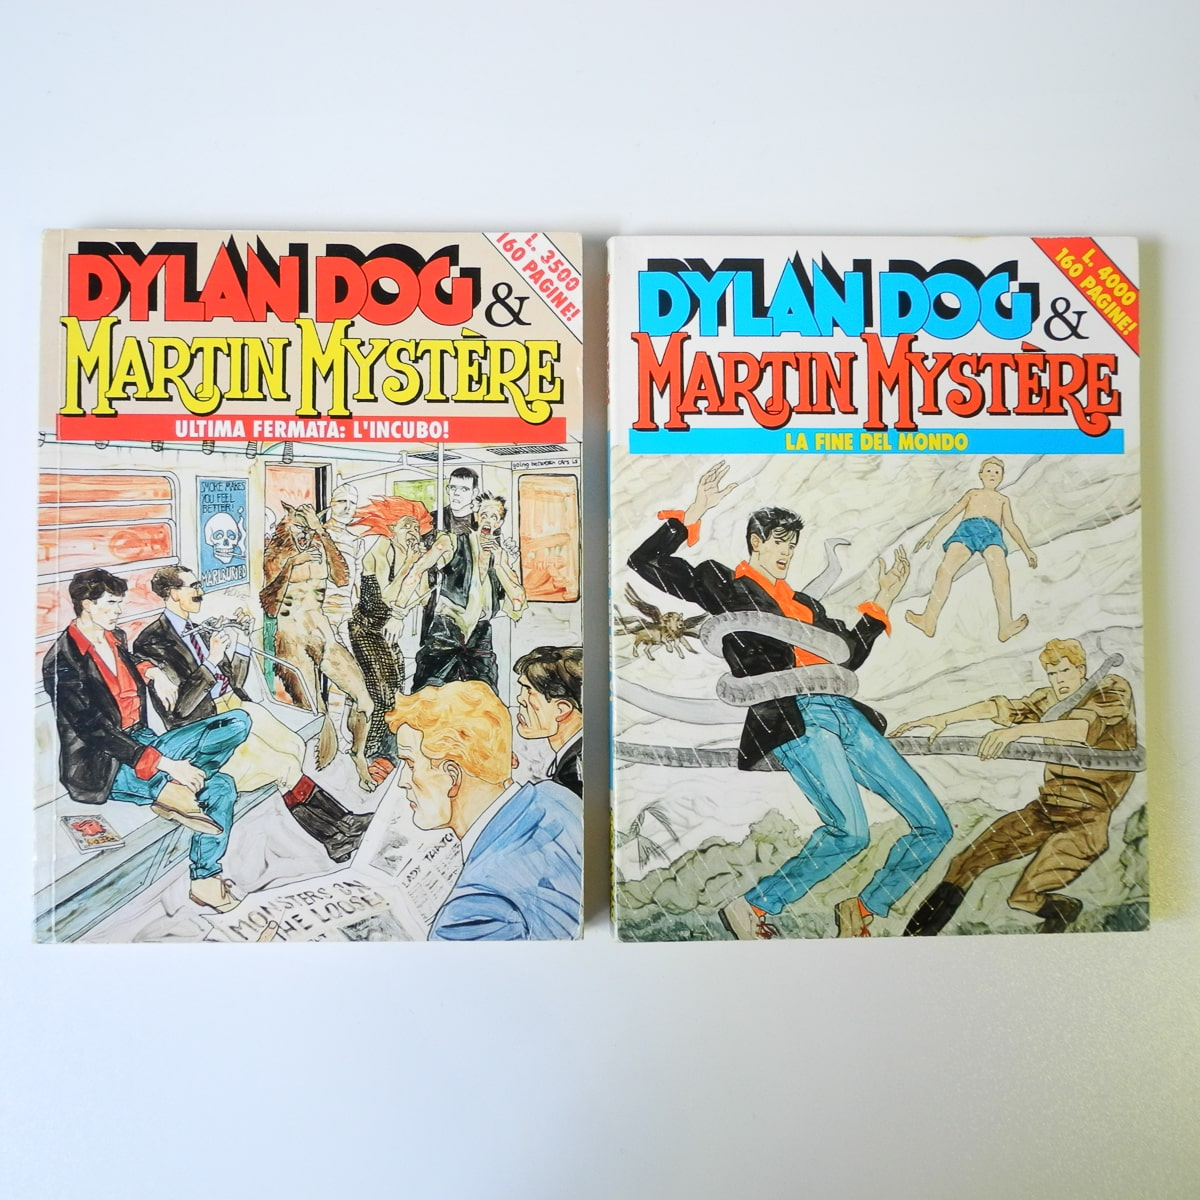 Dylan Dog & Martin Mystere originali